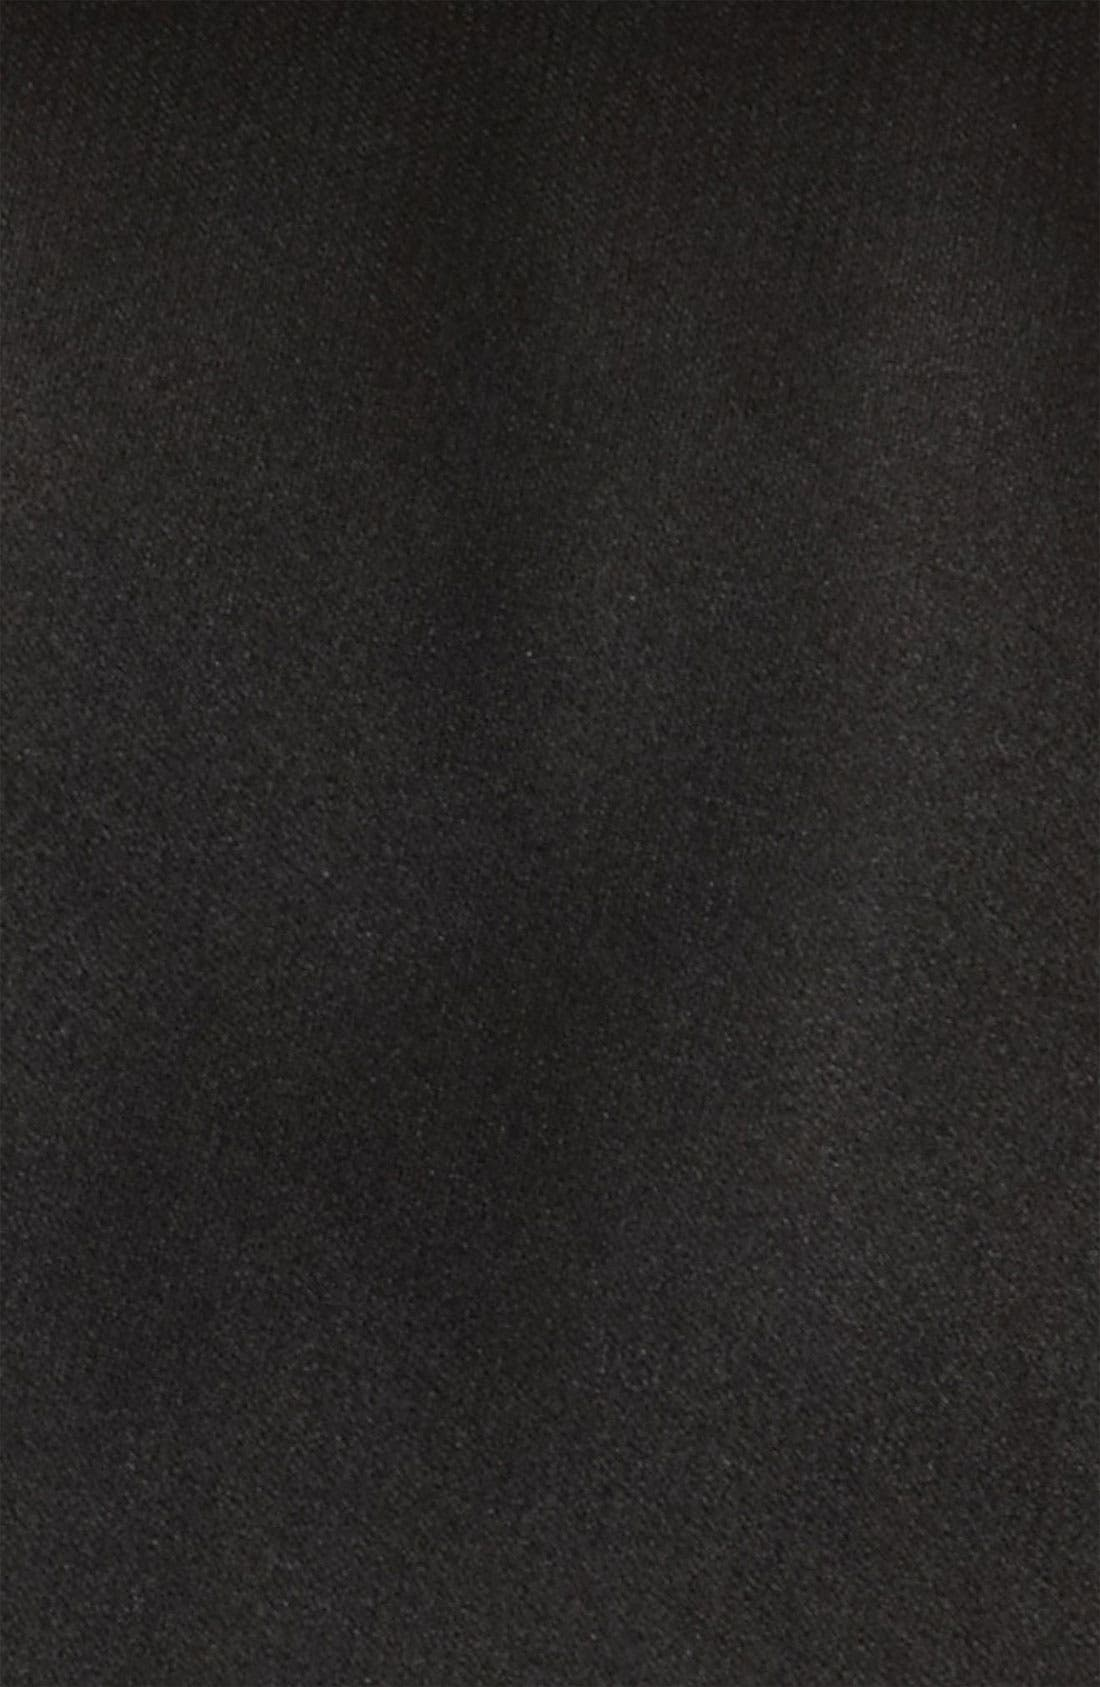 HUGO BOSS Woven Silk Tie,                             Alternate thumbnail 2, color,                             001